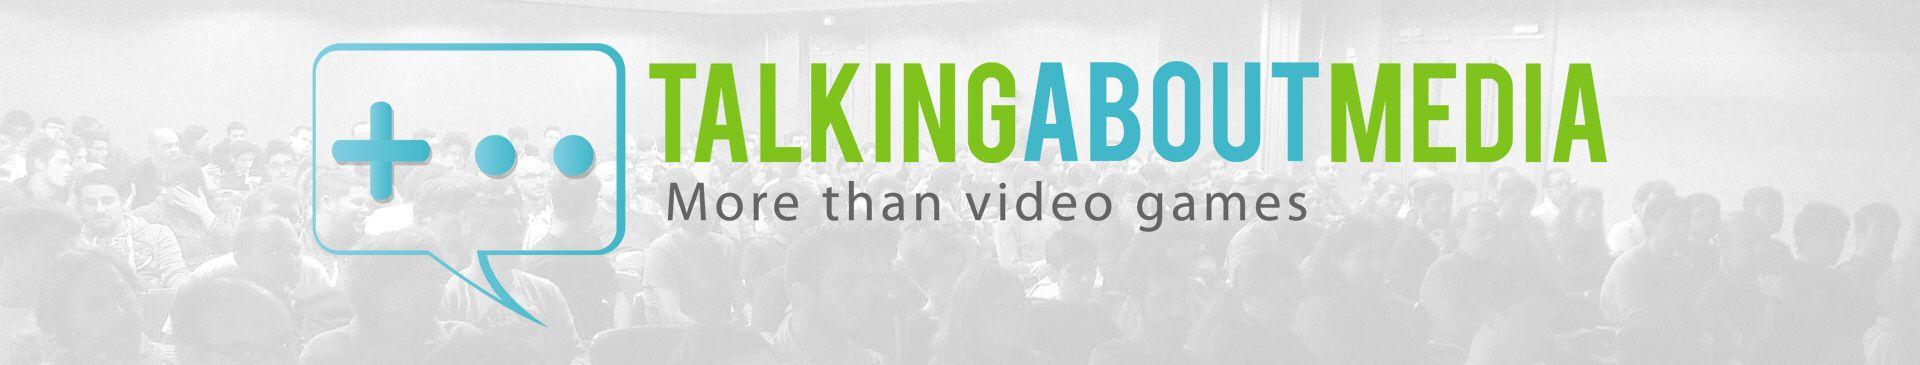 talkingaboutmedia_logo